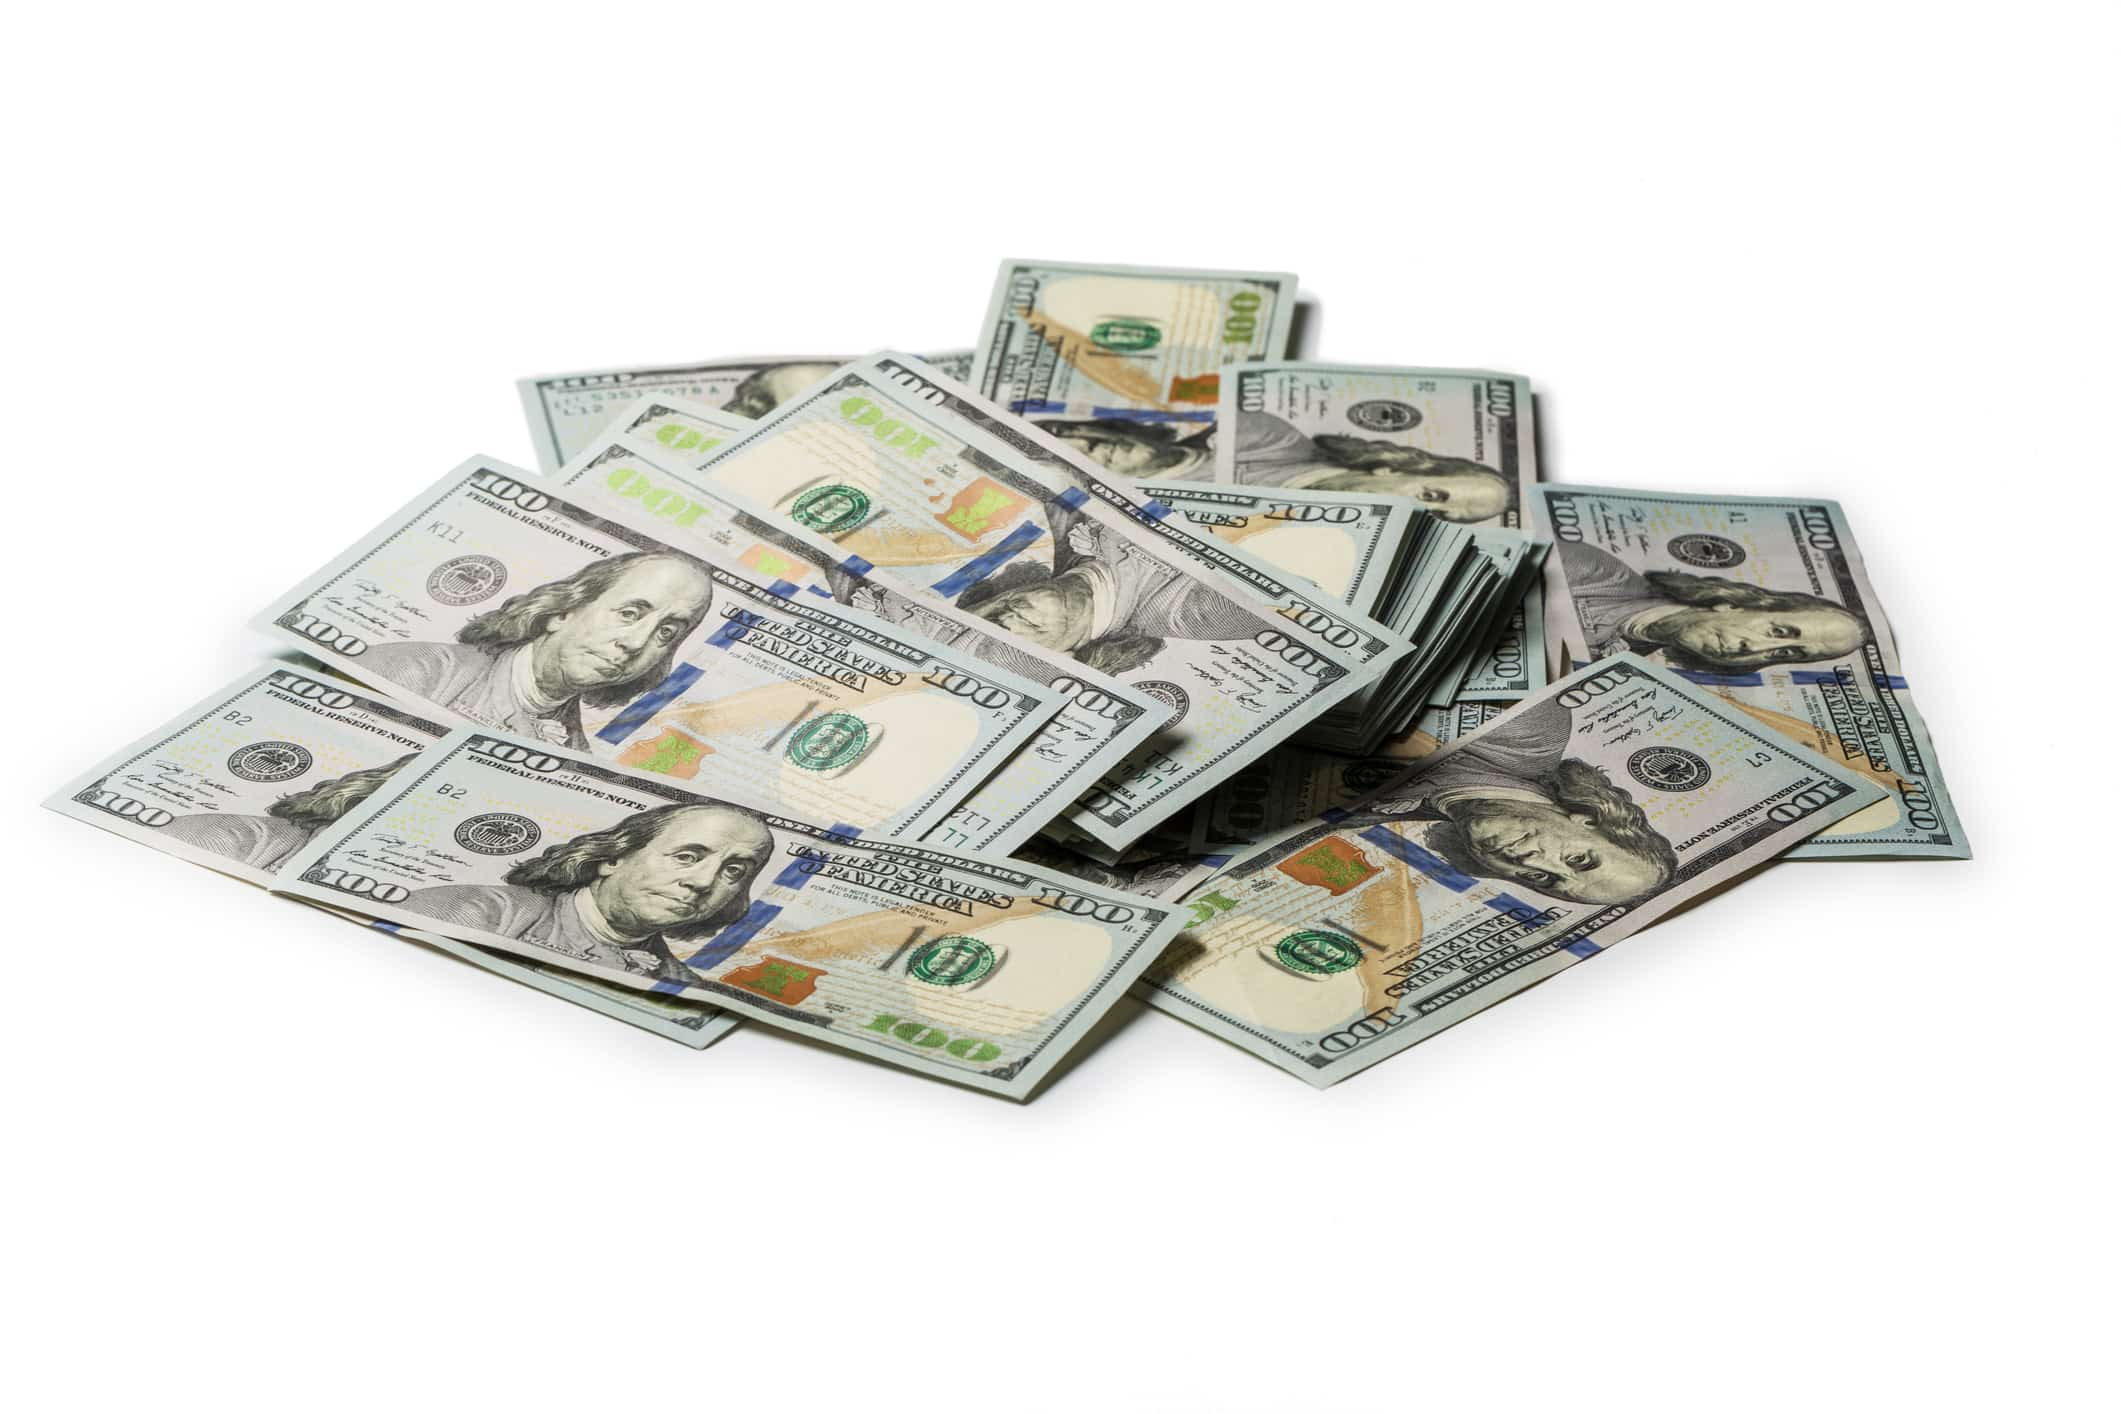 bundles of US 100 dollar bills